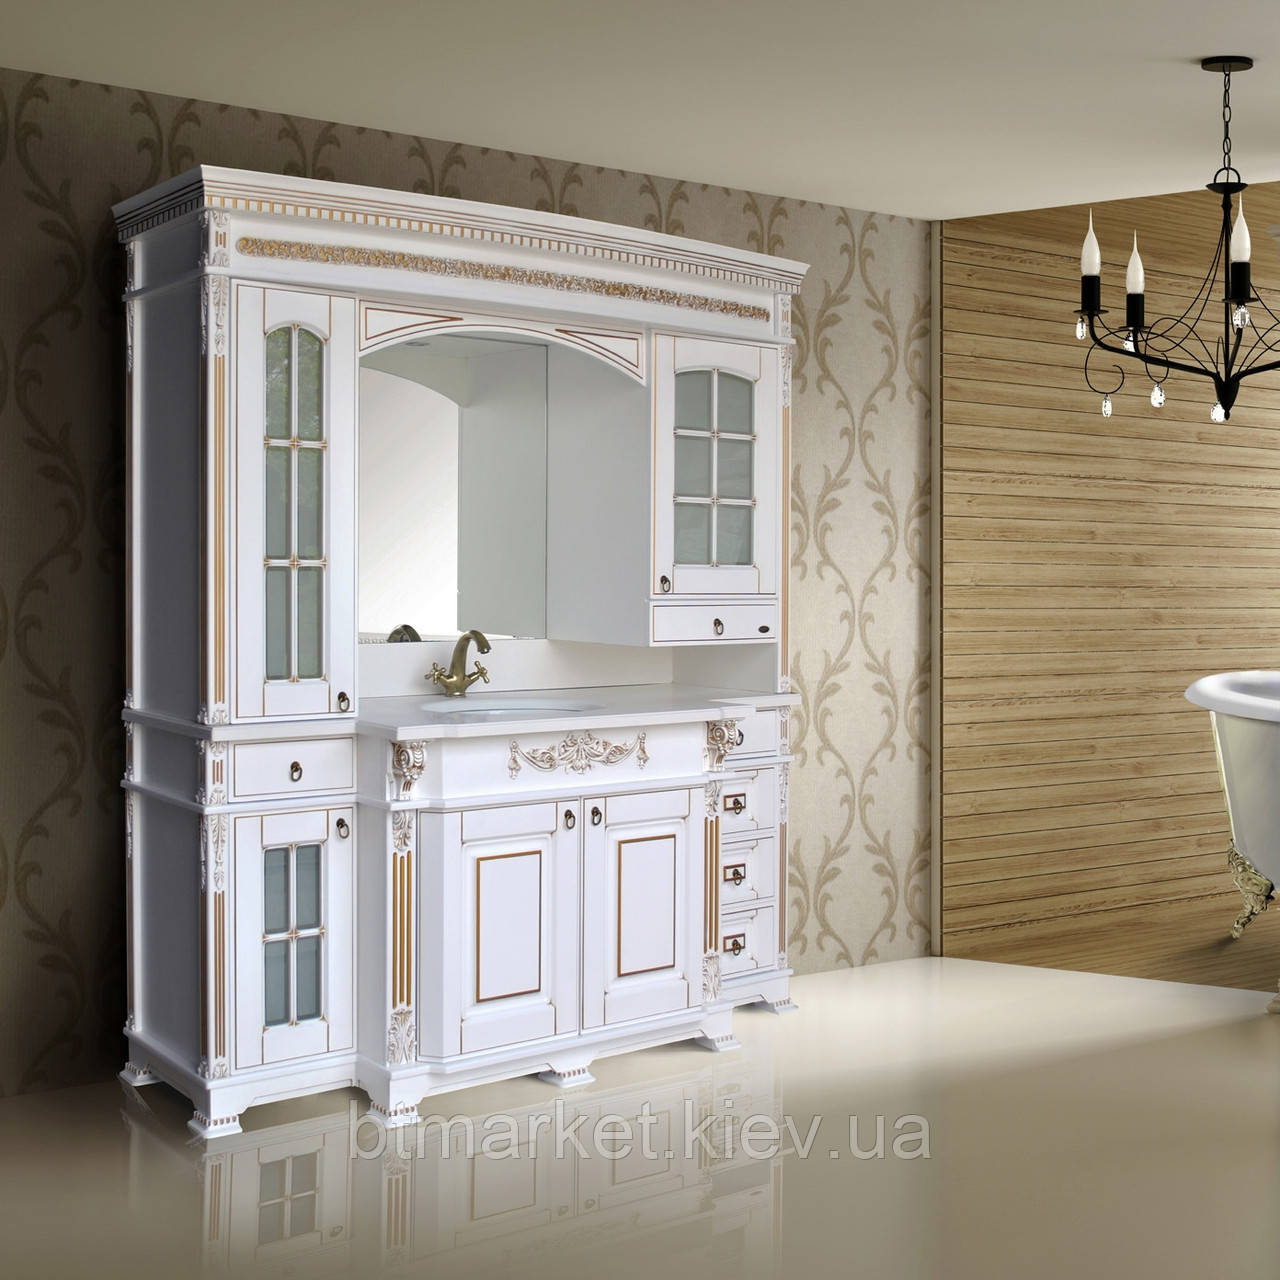 Комплект мебели Ольвия (Атолл) Людовик white gold (белый мат + золото)